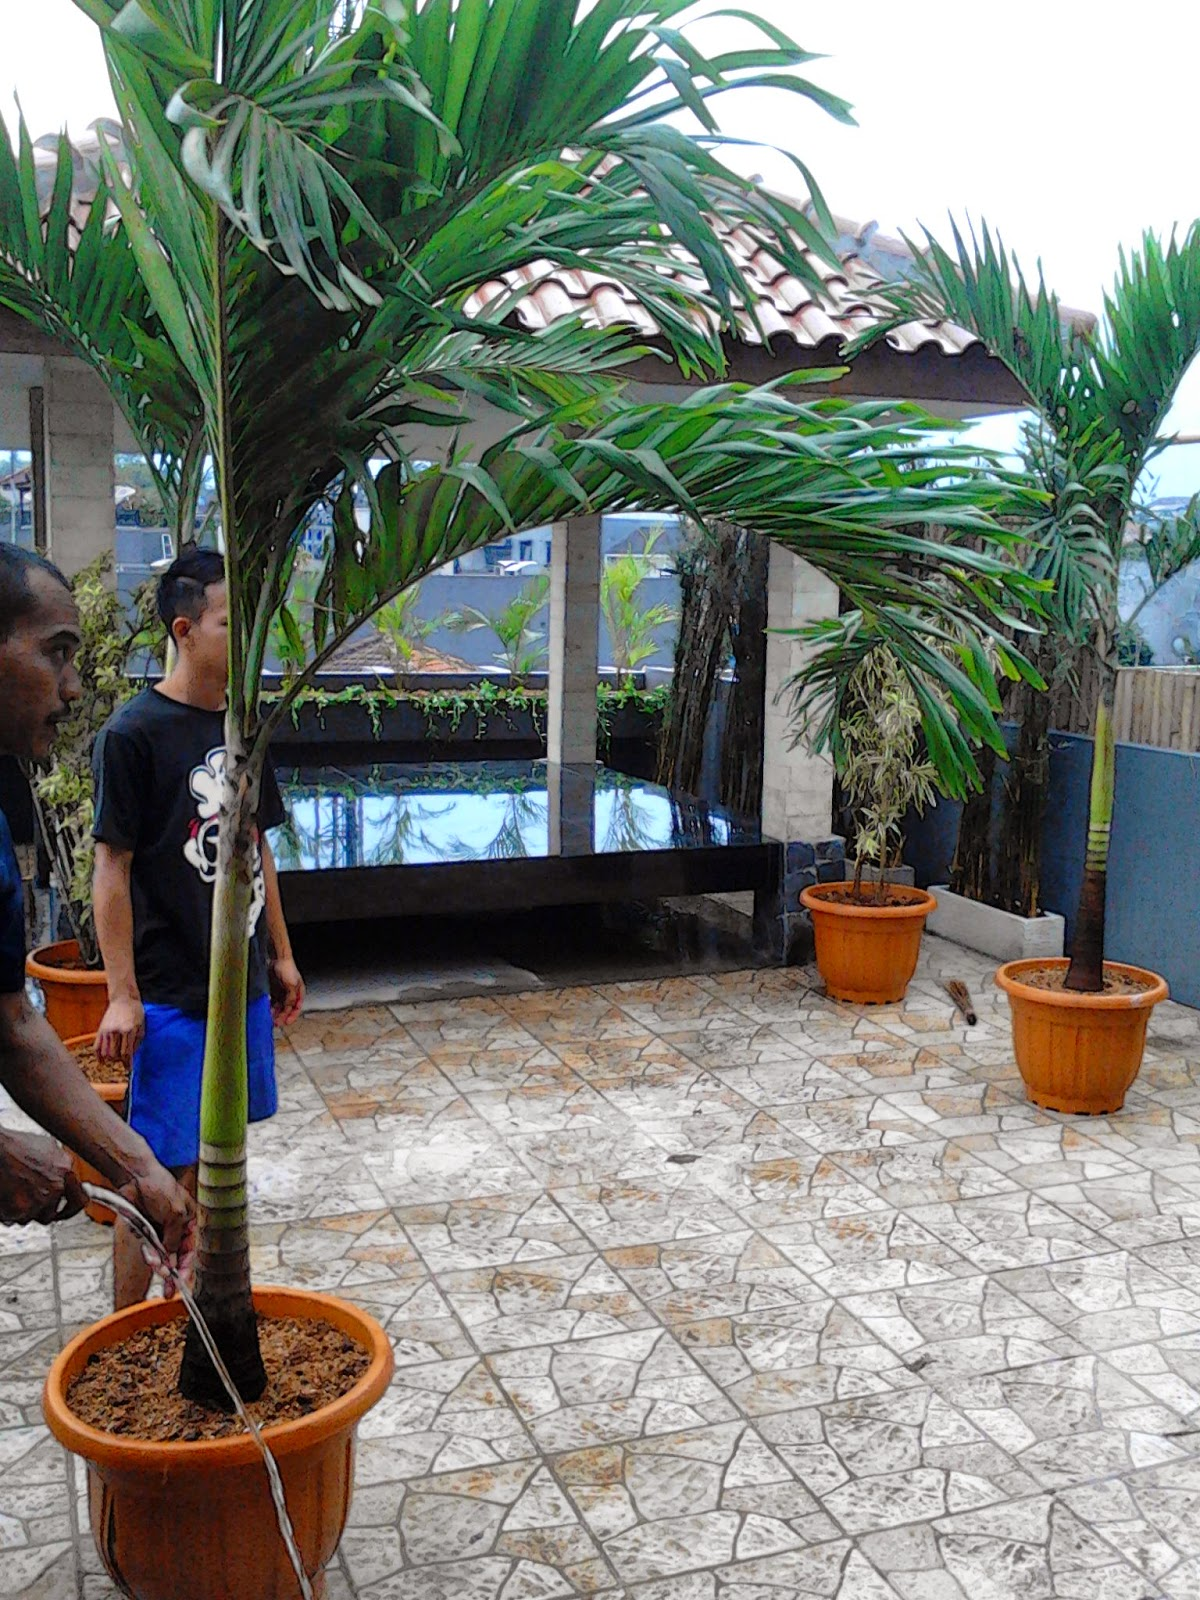 Jual pohon palm putri | suplier tanaman | tanaman hias | jasa desain taman